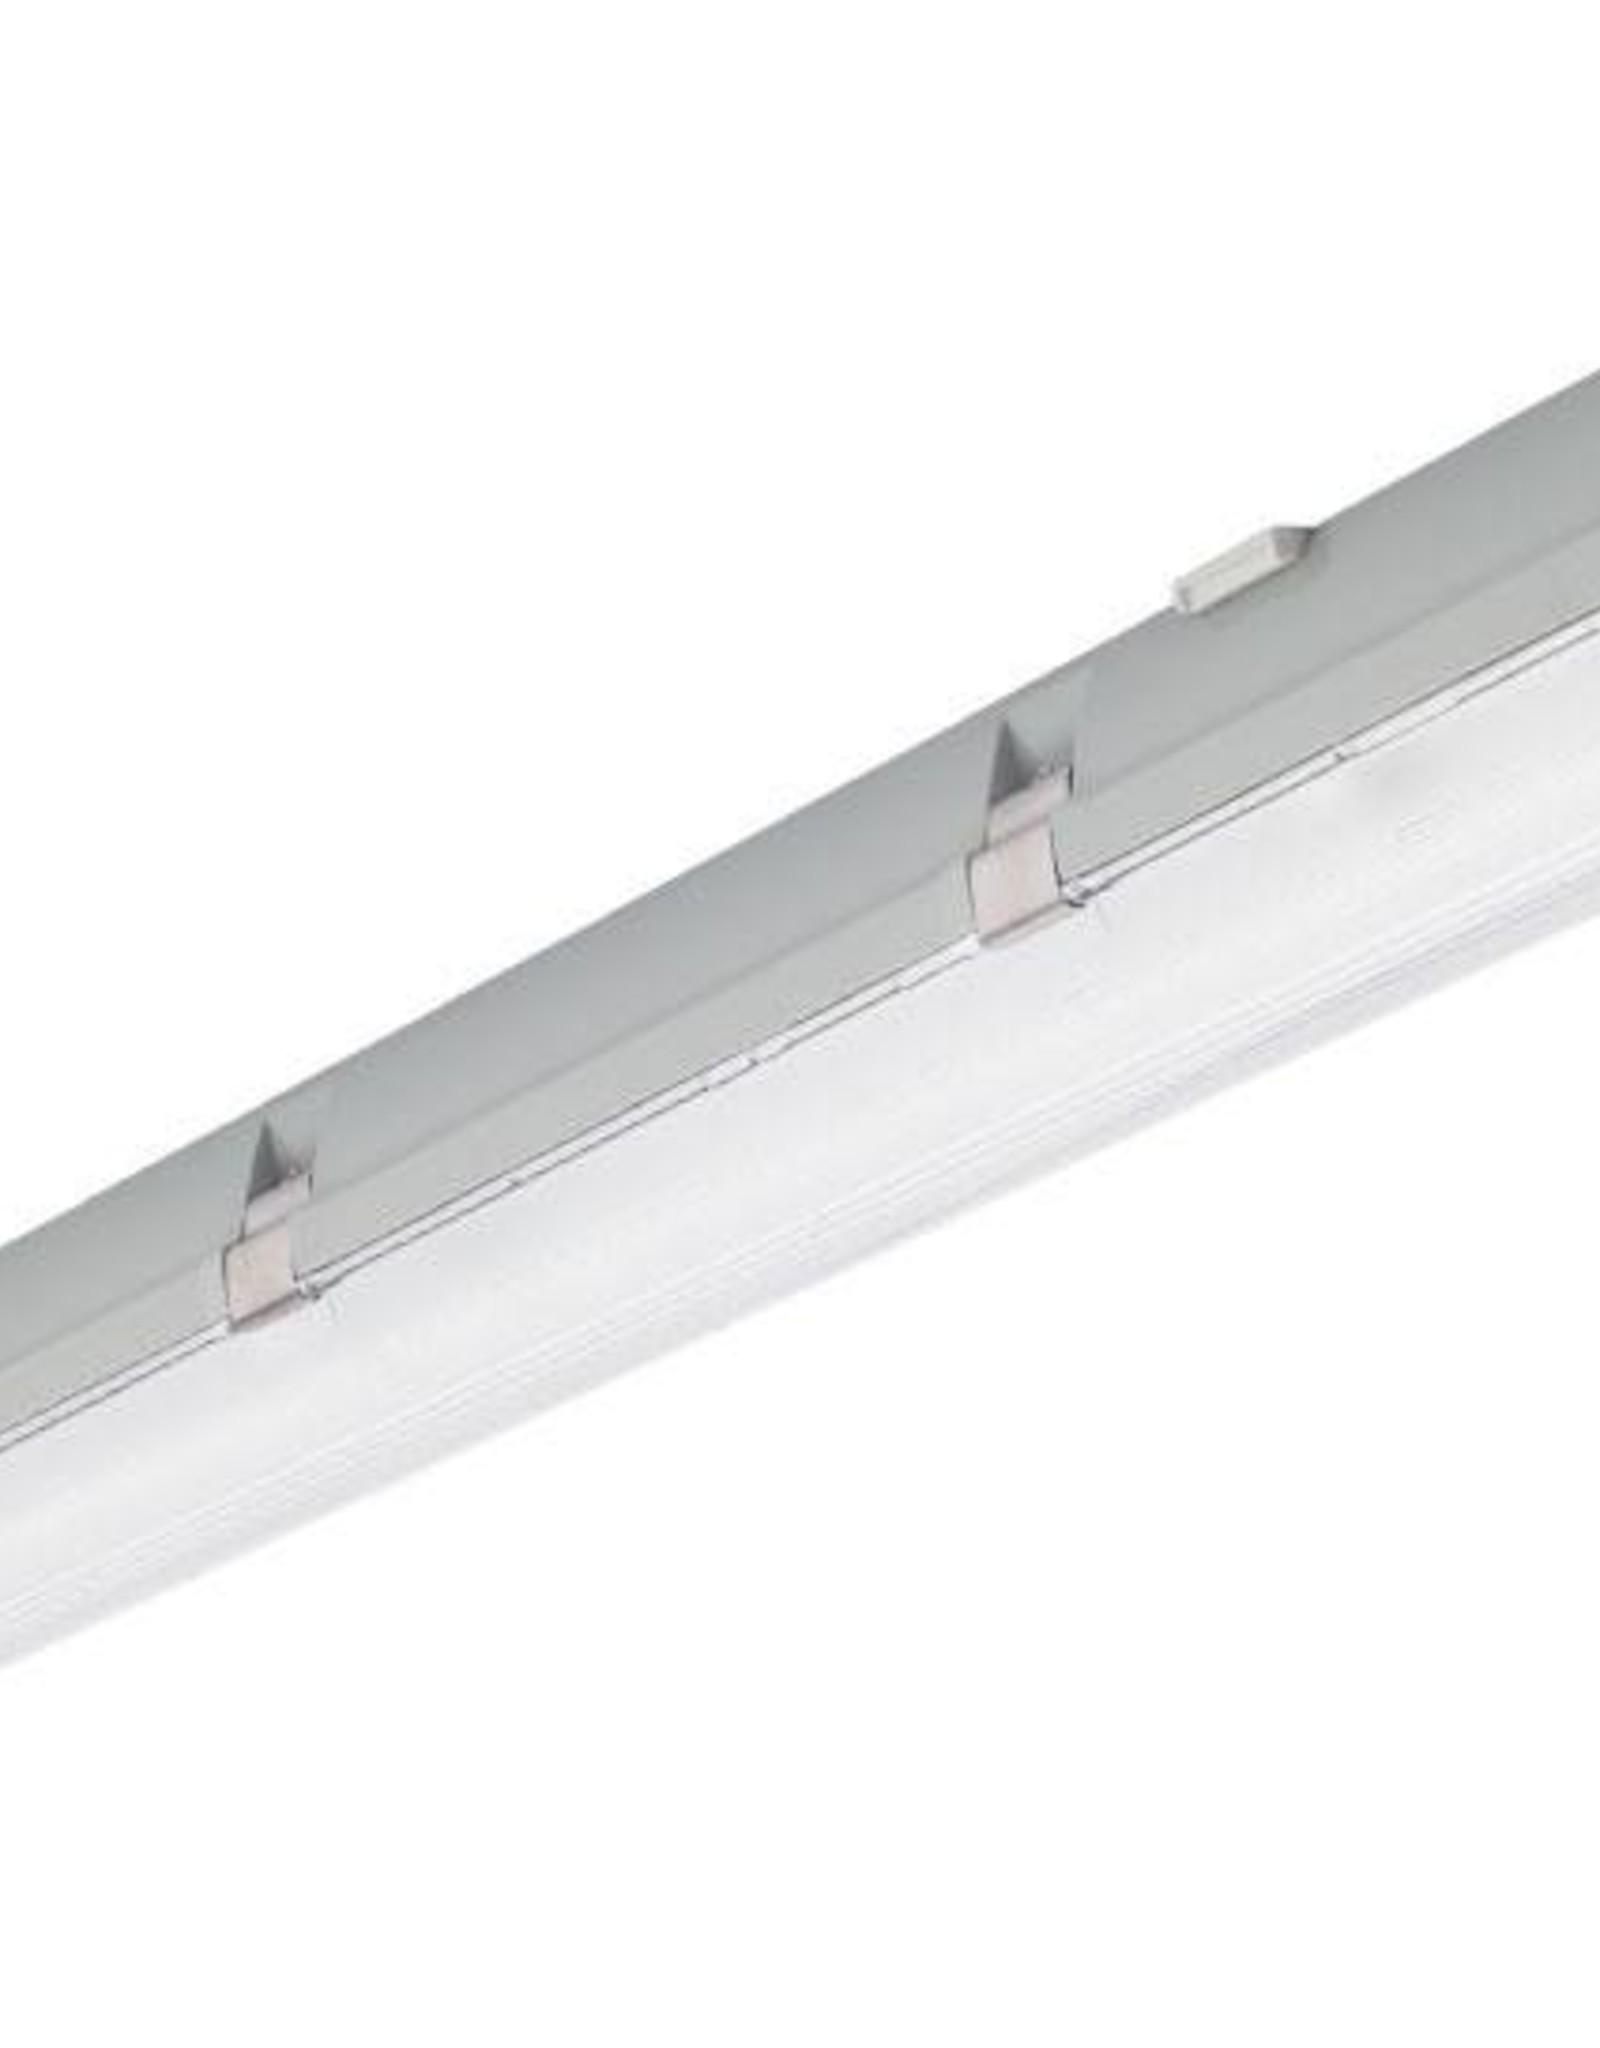 Prima 2x49W HO - ABS - inox clips - HF ballast